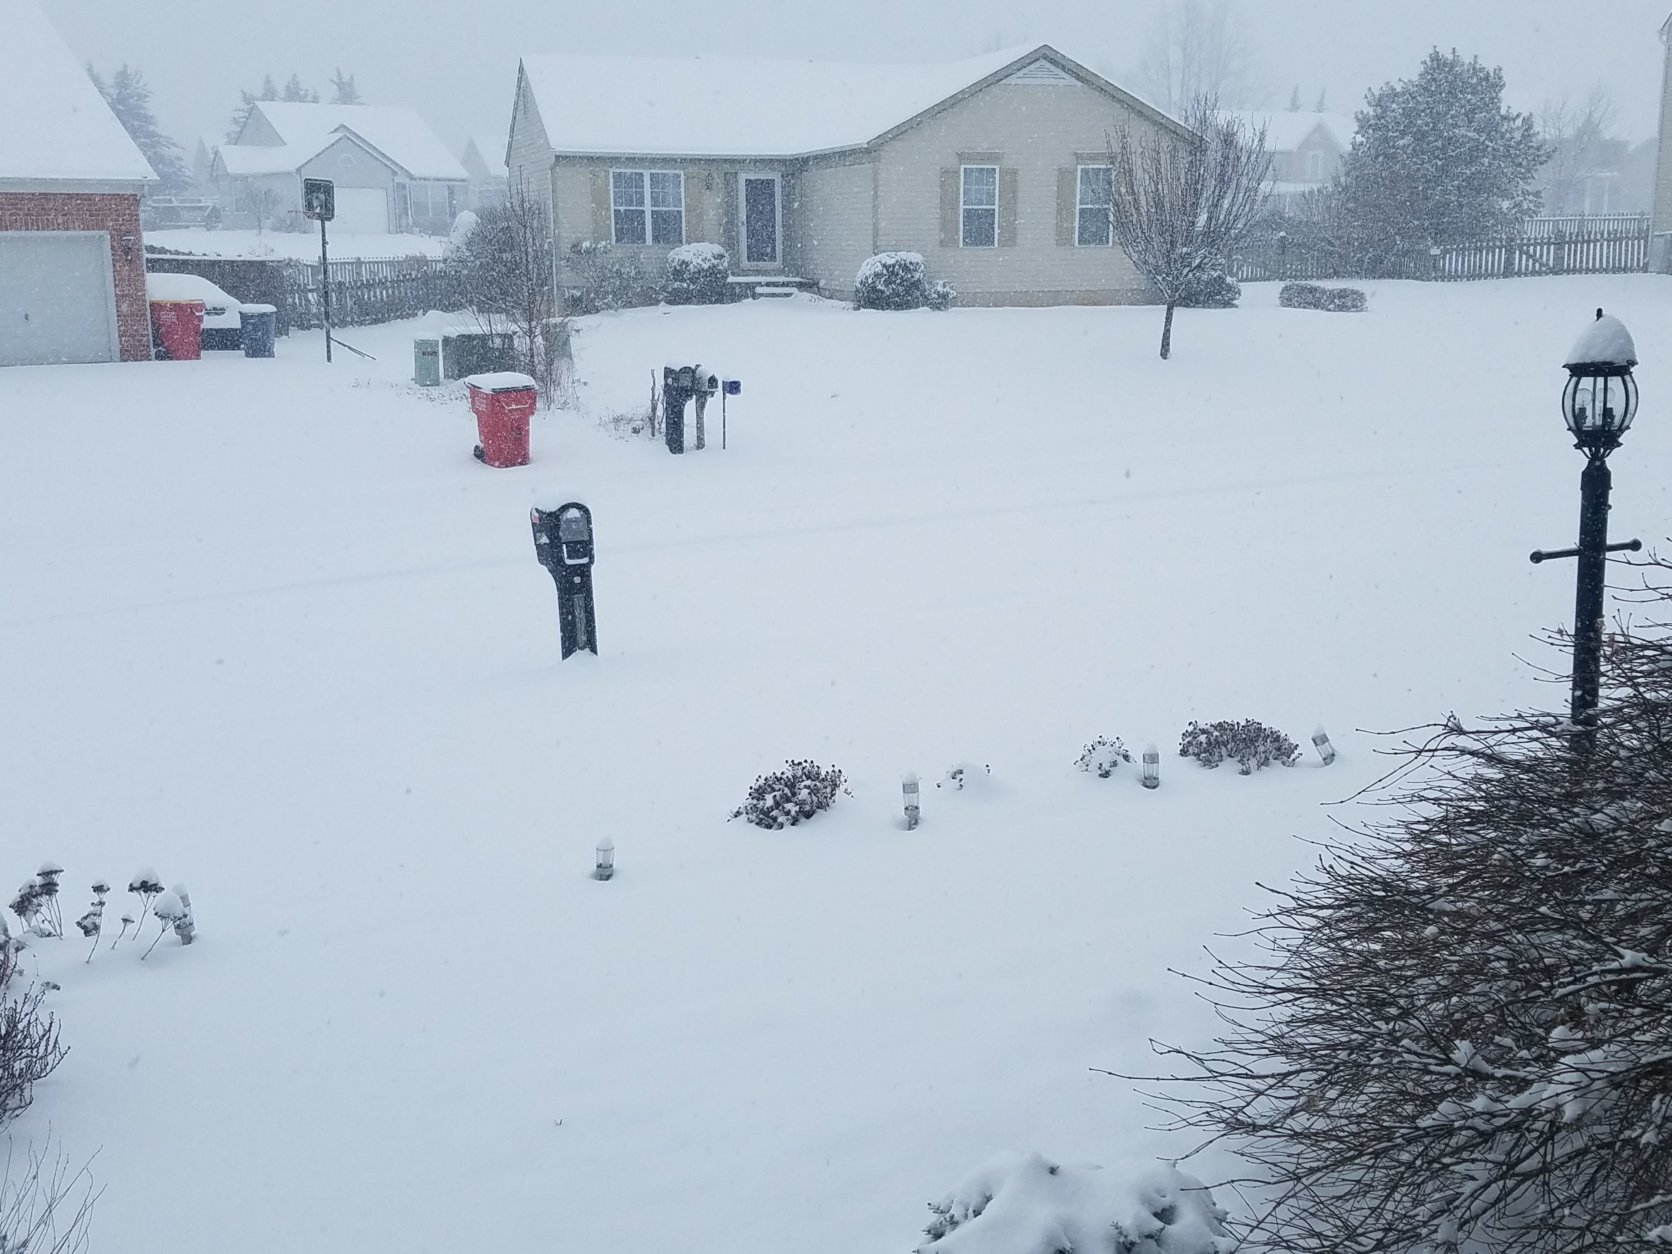 Snow completely blankets a neighborhood in Hagerstown, Maryland. (Courtesy Kirk Marek)